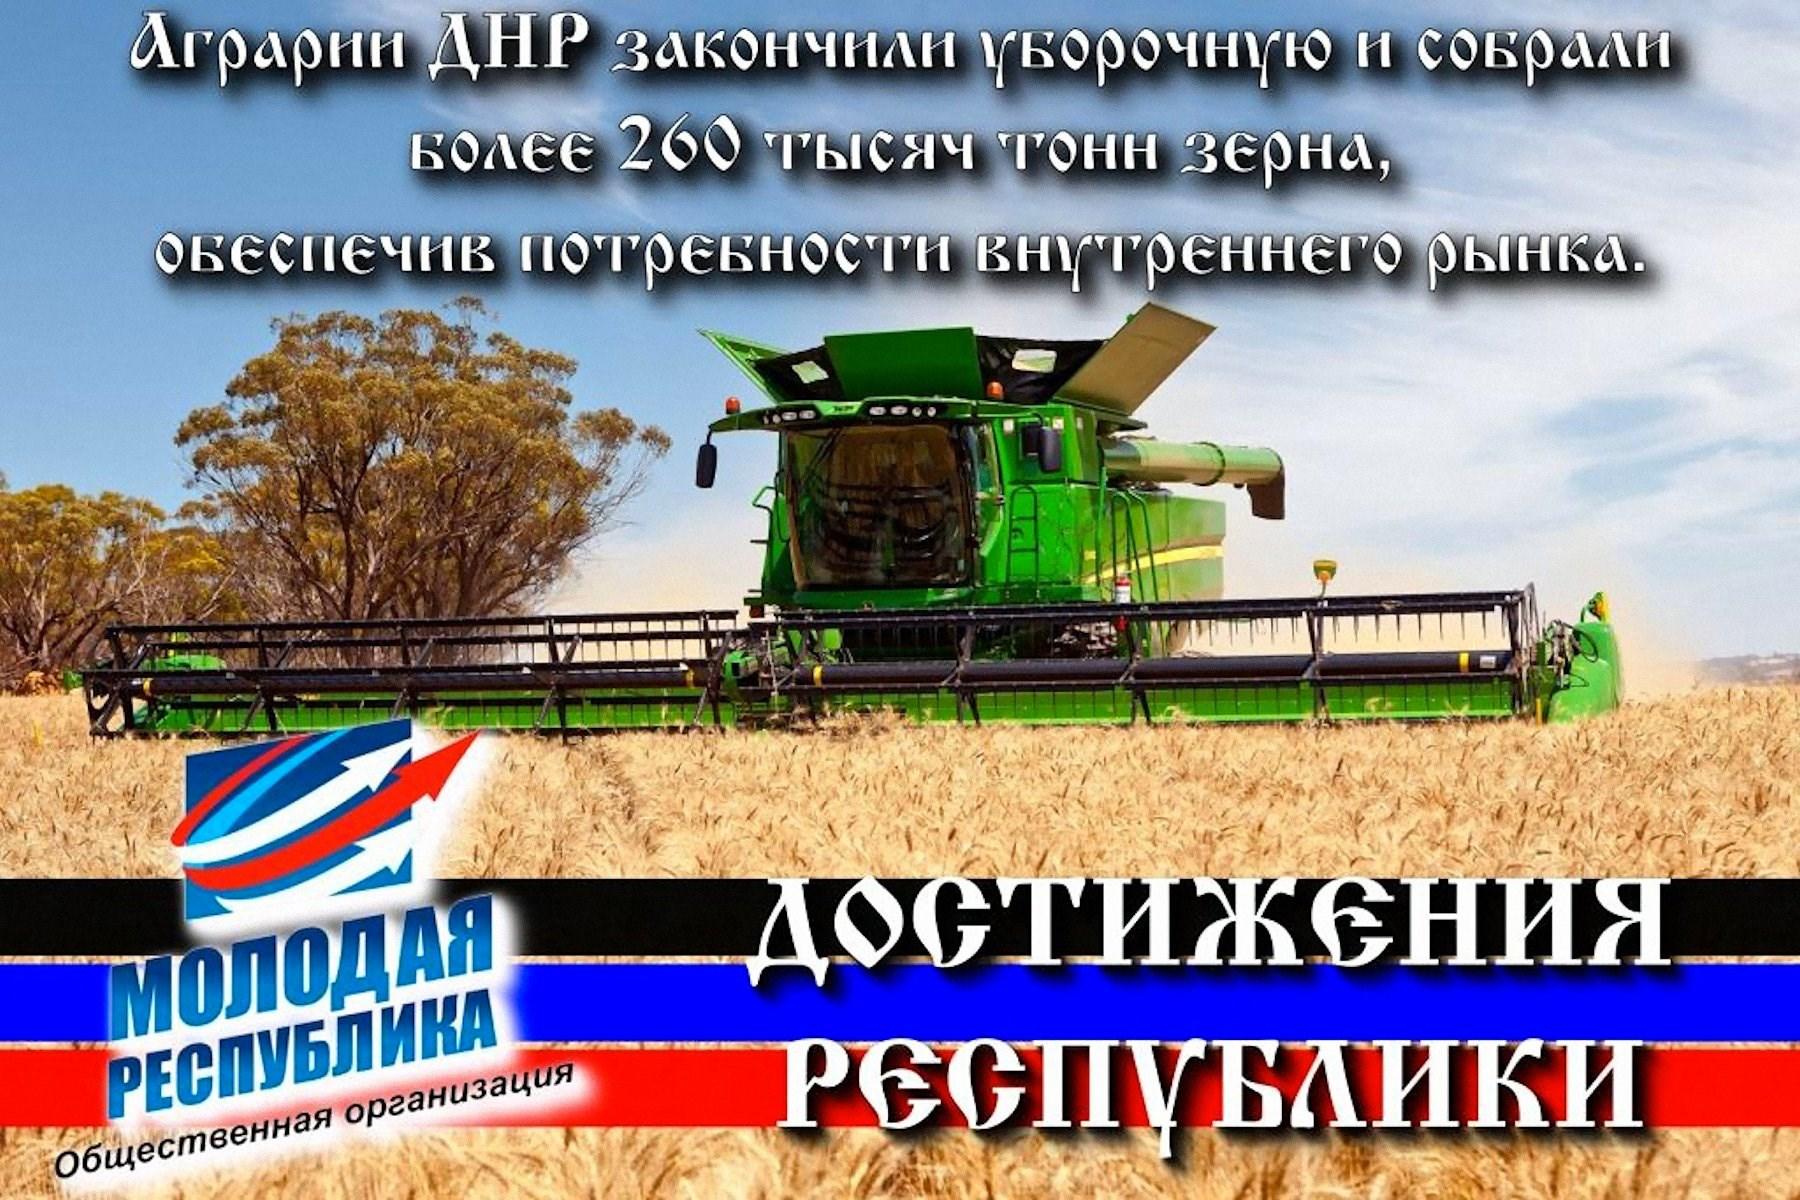 00 property of the republic dnr donetsk pr 05 280815